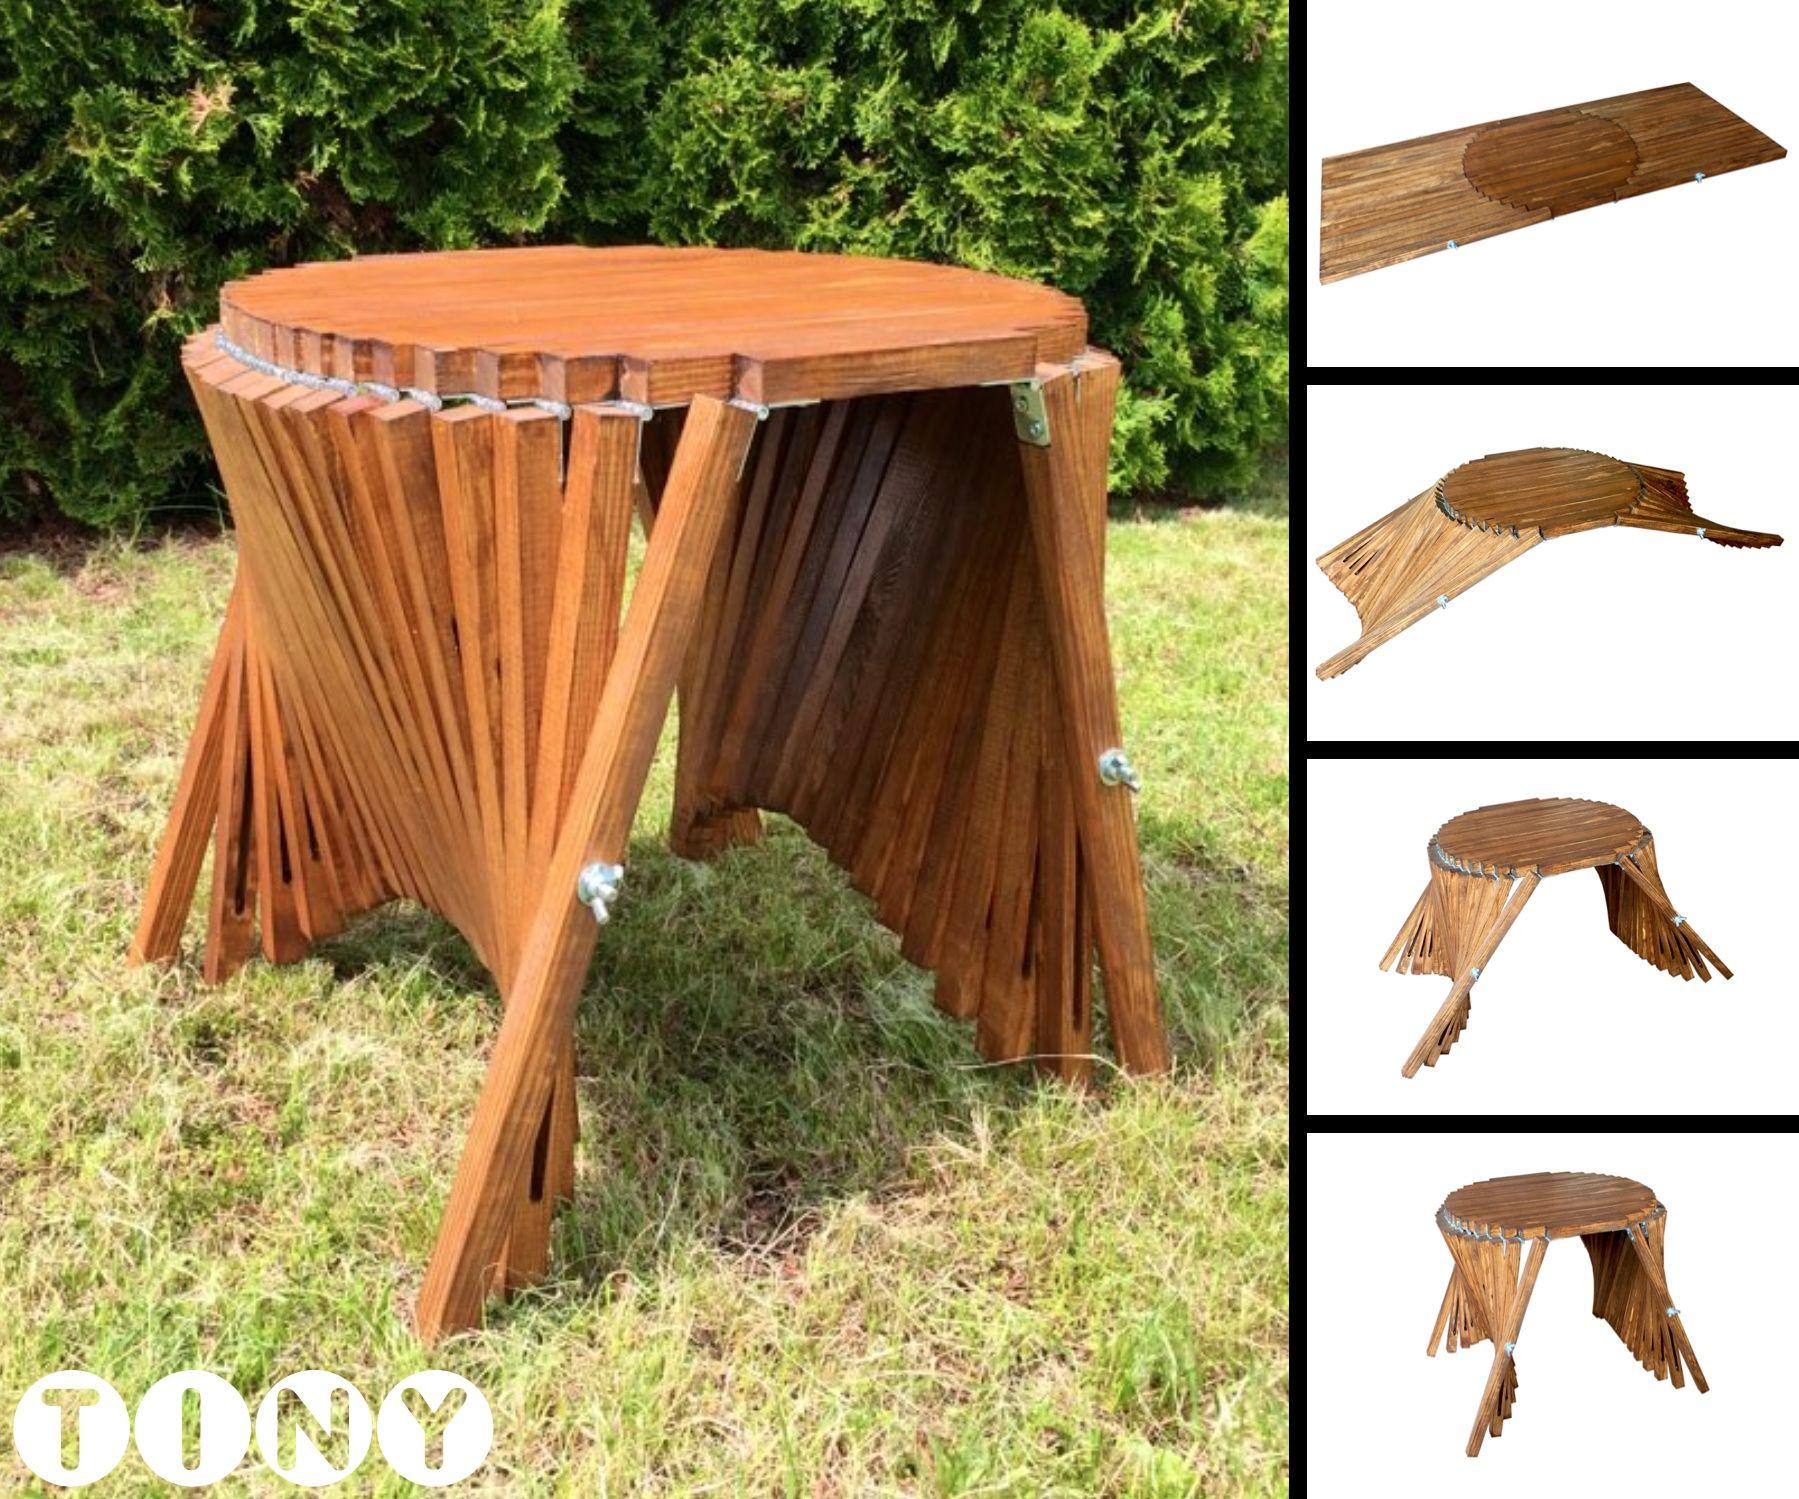 DIY Rising Table